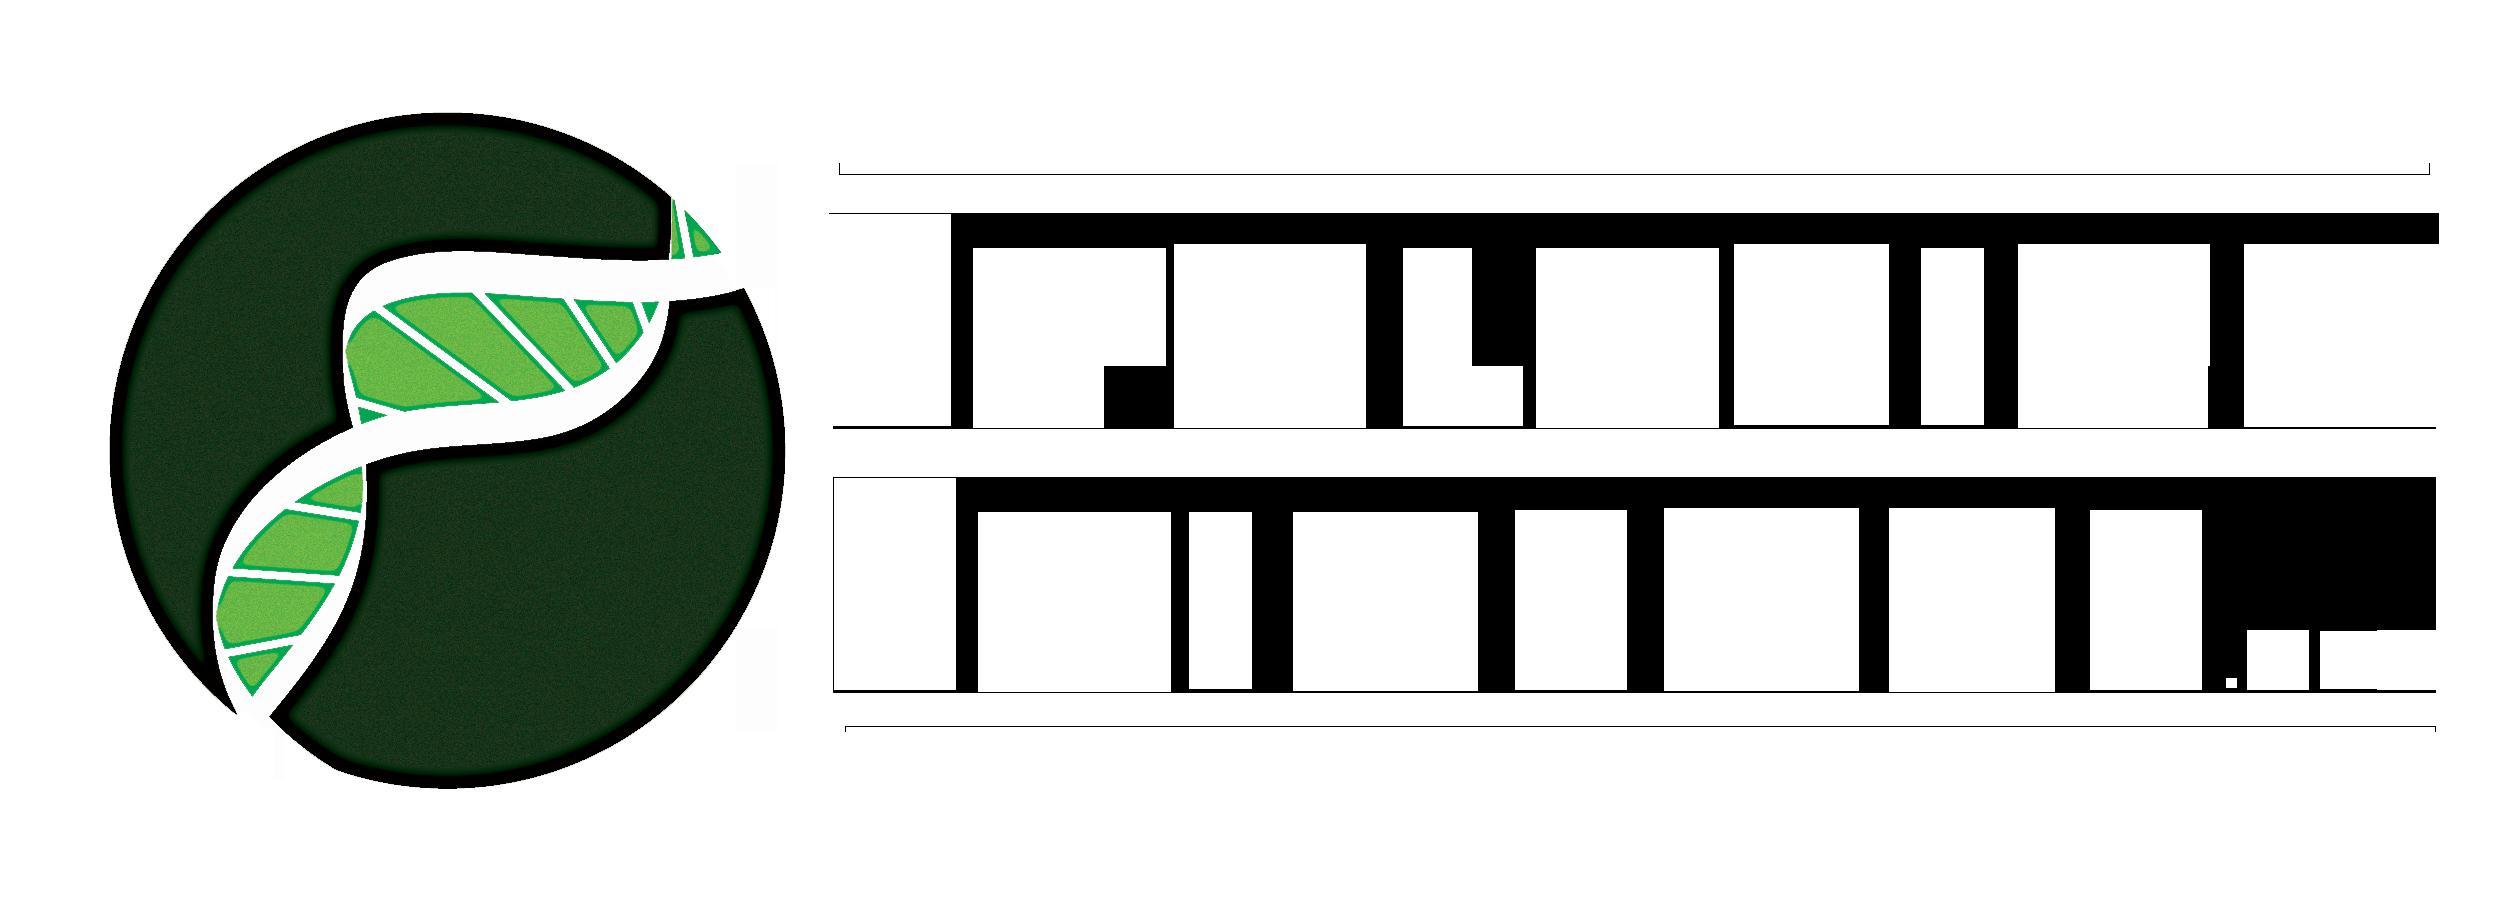 Evolution evolutionevidence org a. Evidence clipart scientific evidence